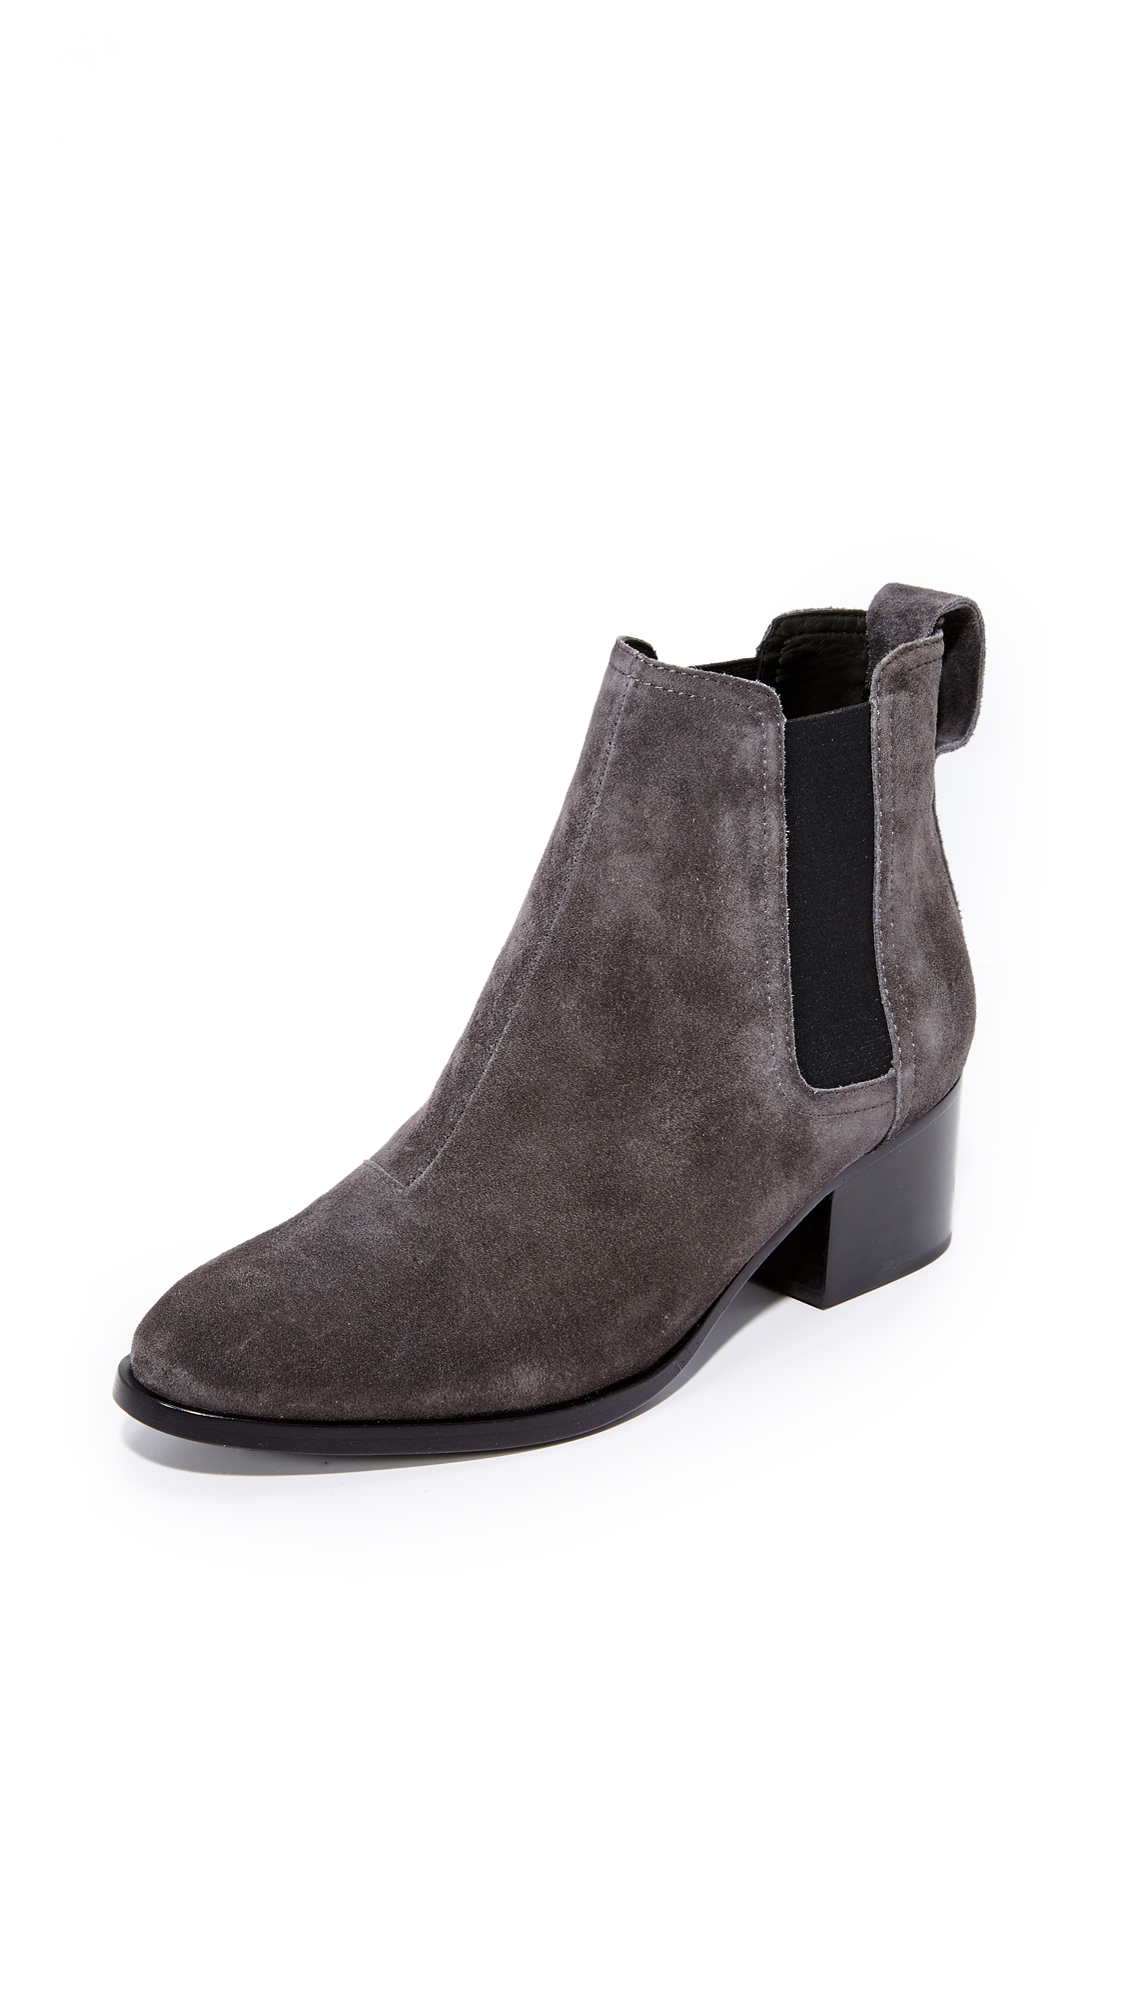 Rag & Bone Walker Boots - Asphalt